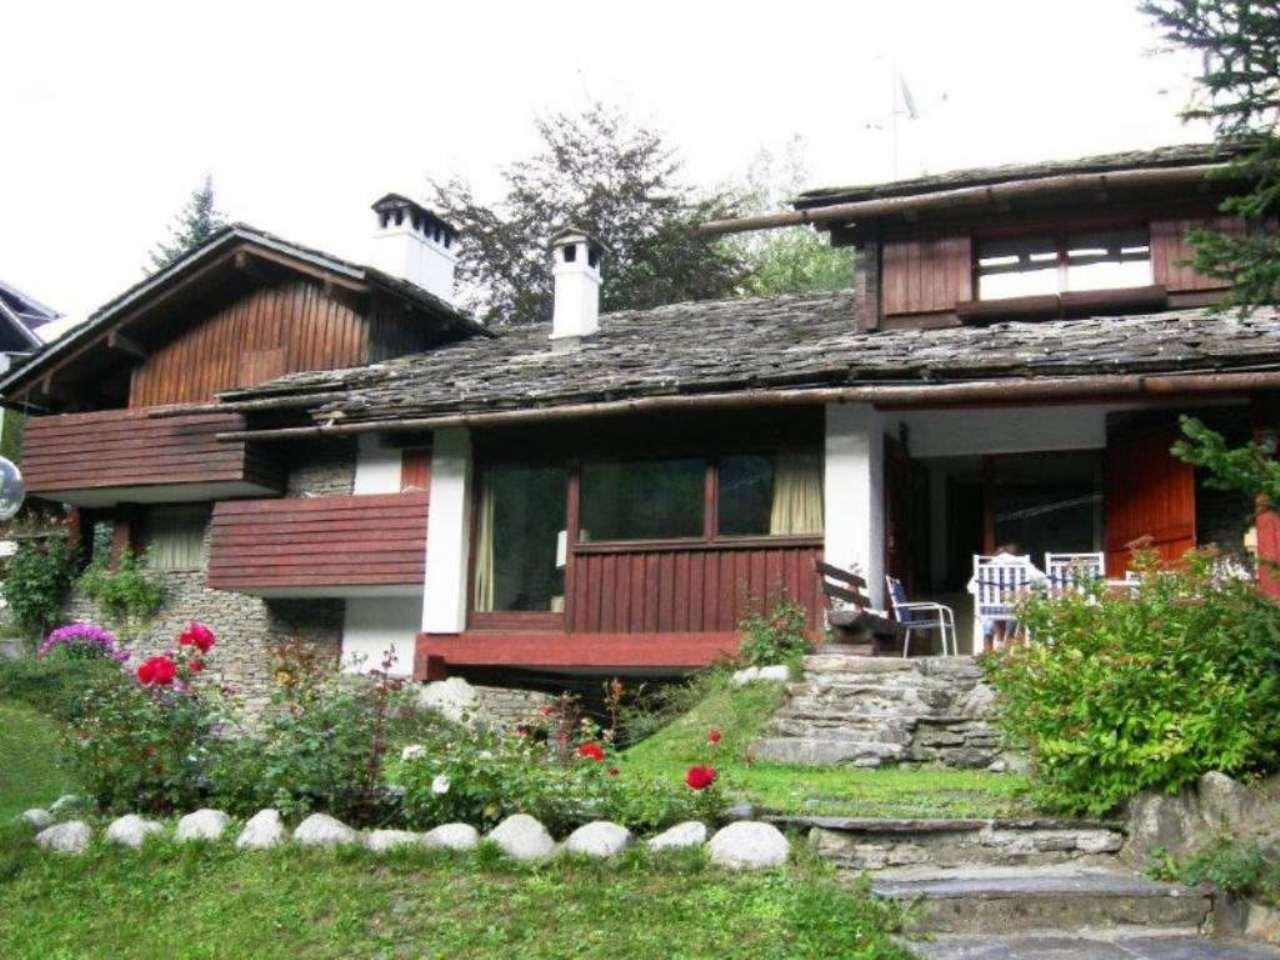 Villa in Vendita a Courmayeur: 5 locali, 450 mq - Foto 3